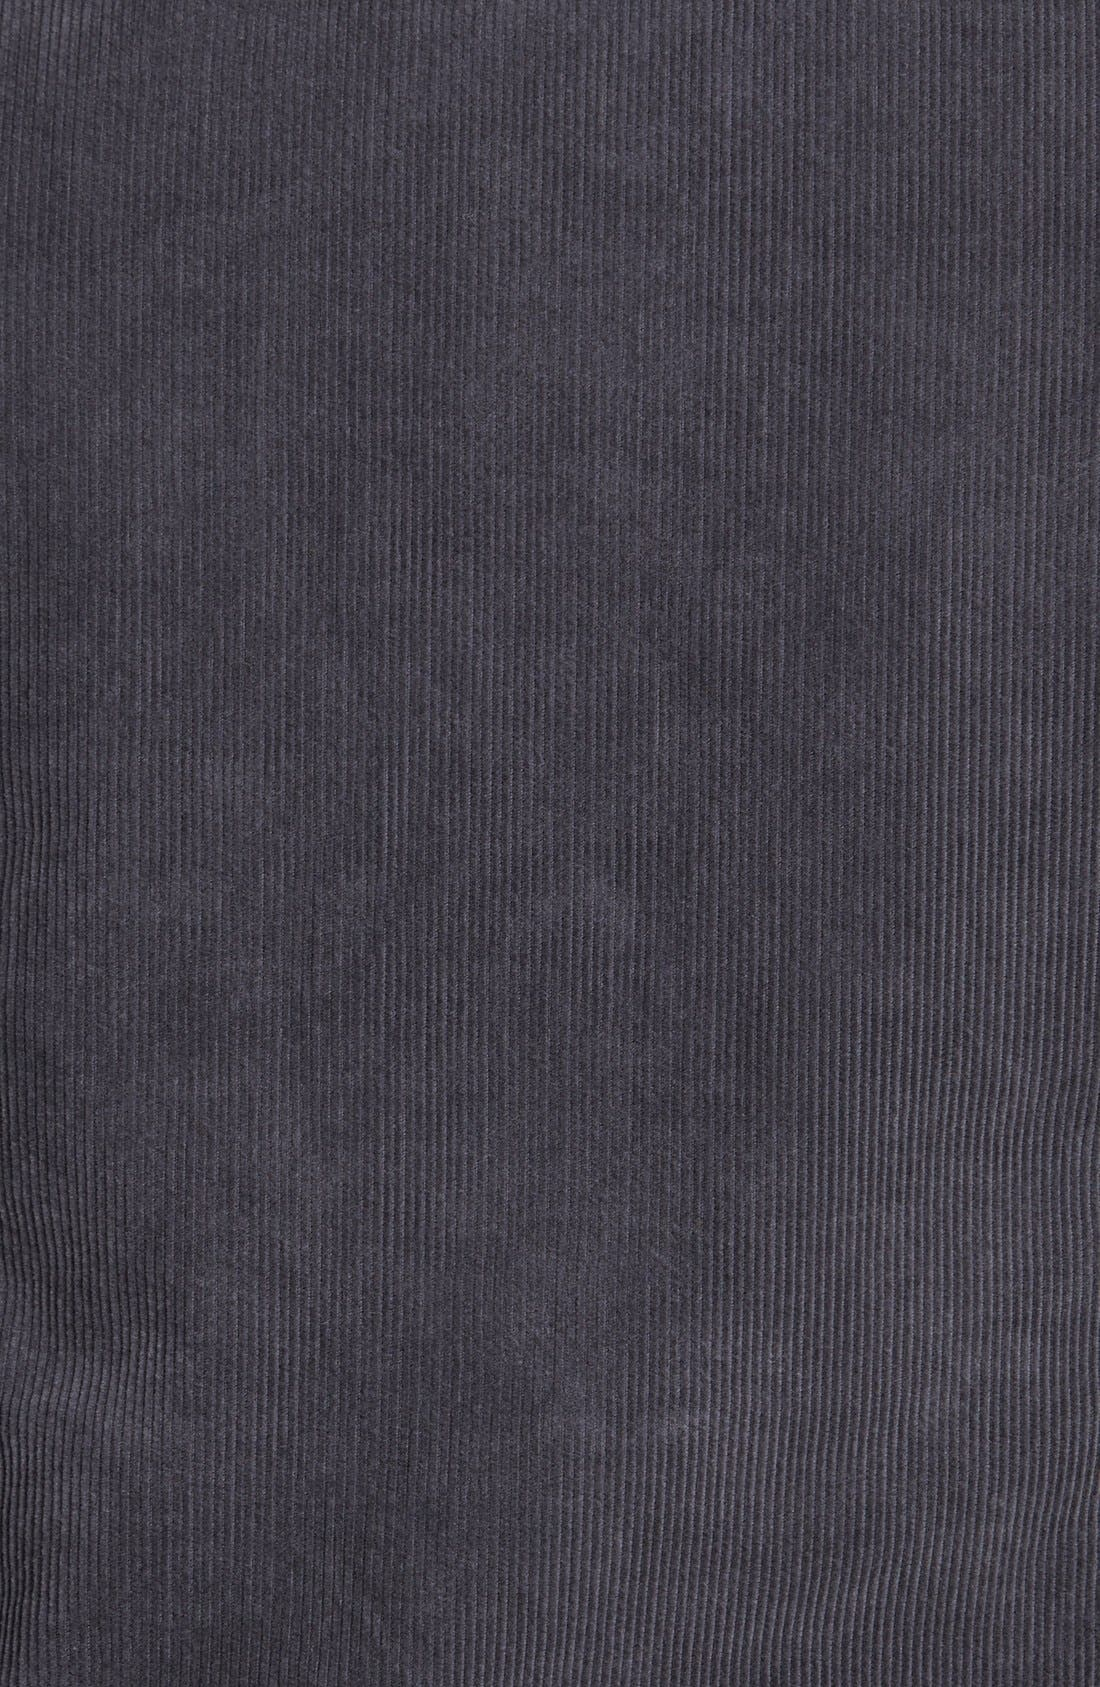 Alternate Image 3  - AG Jeans 'Jake' Slim Fit Corduroy Jacket